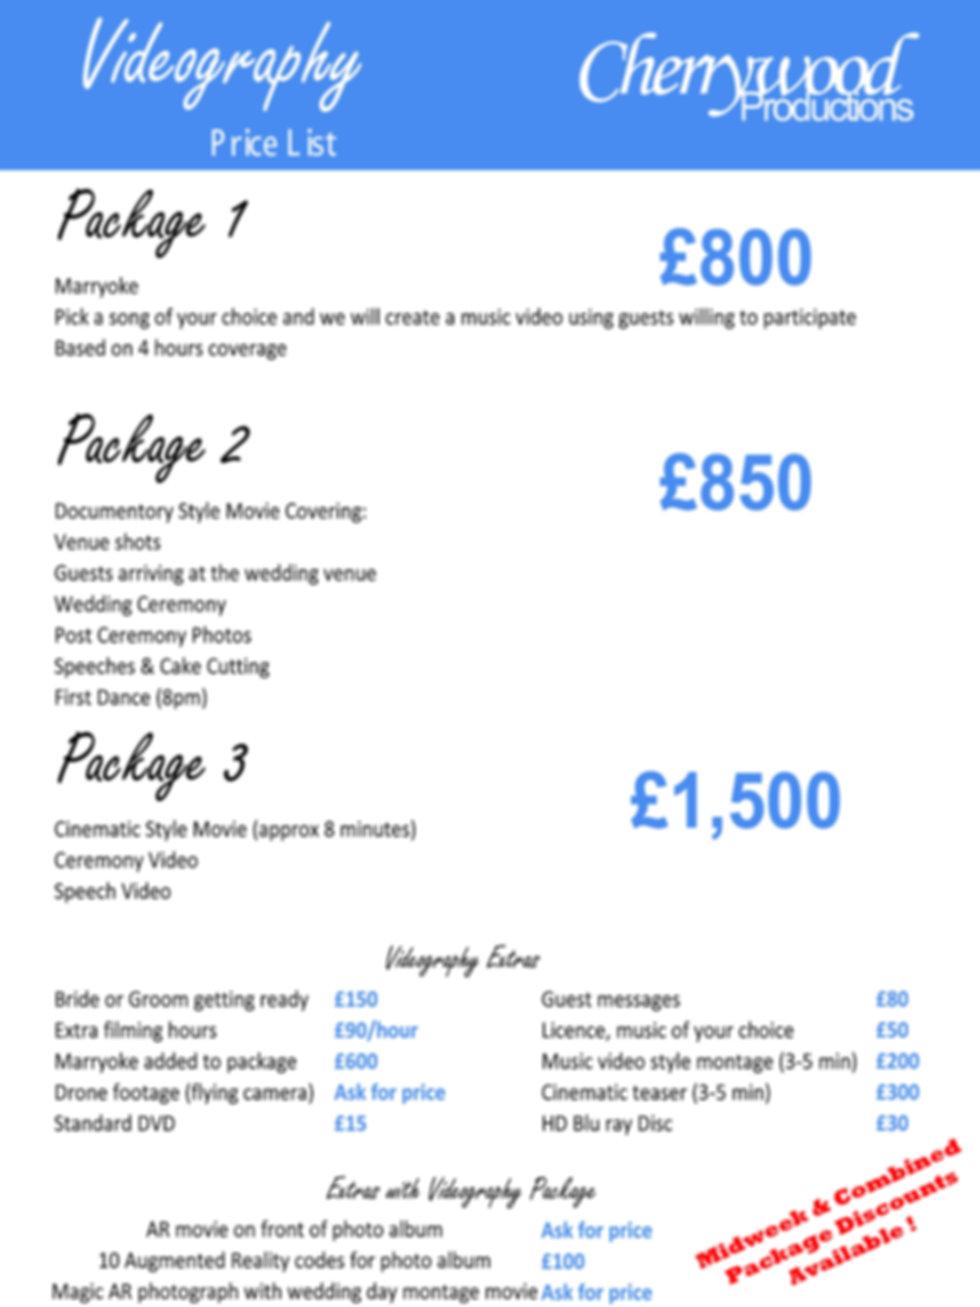 cherrywood video price list 2020.jpg